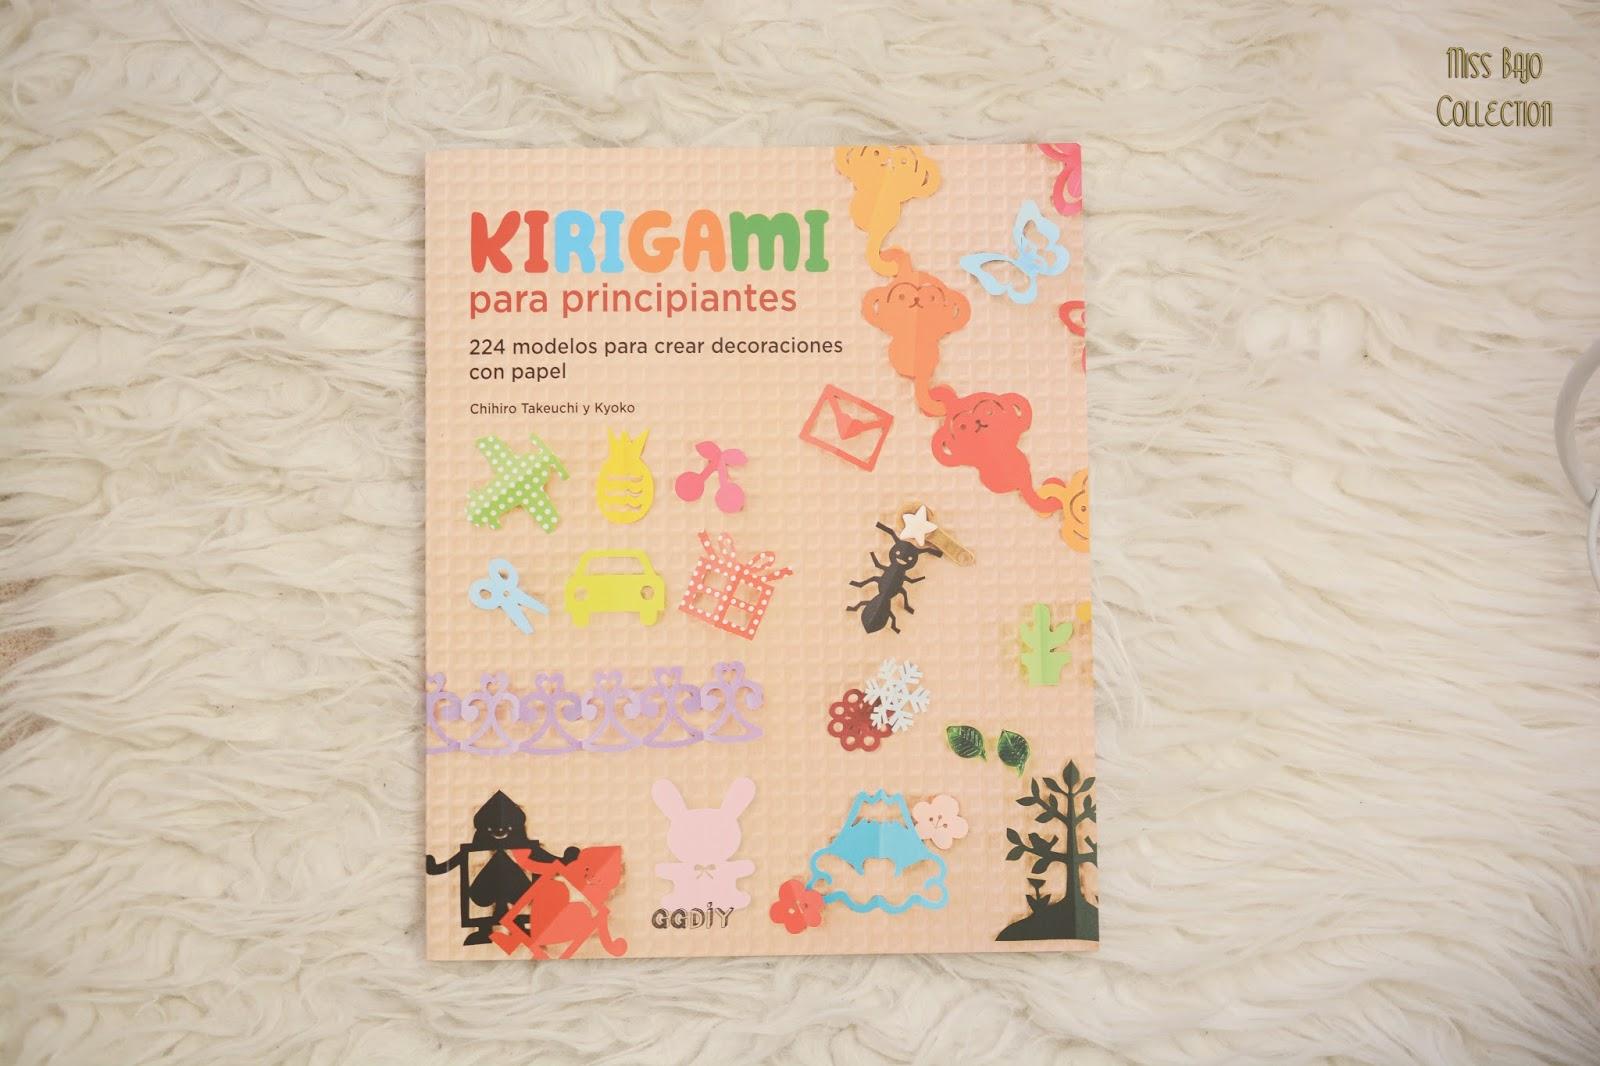 KIRIGAMI PARA PRINCIPIANTES | Miss Bajo Collection